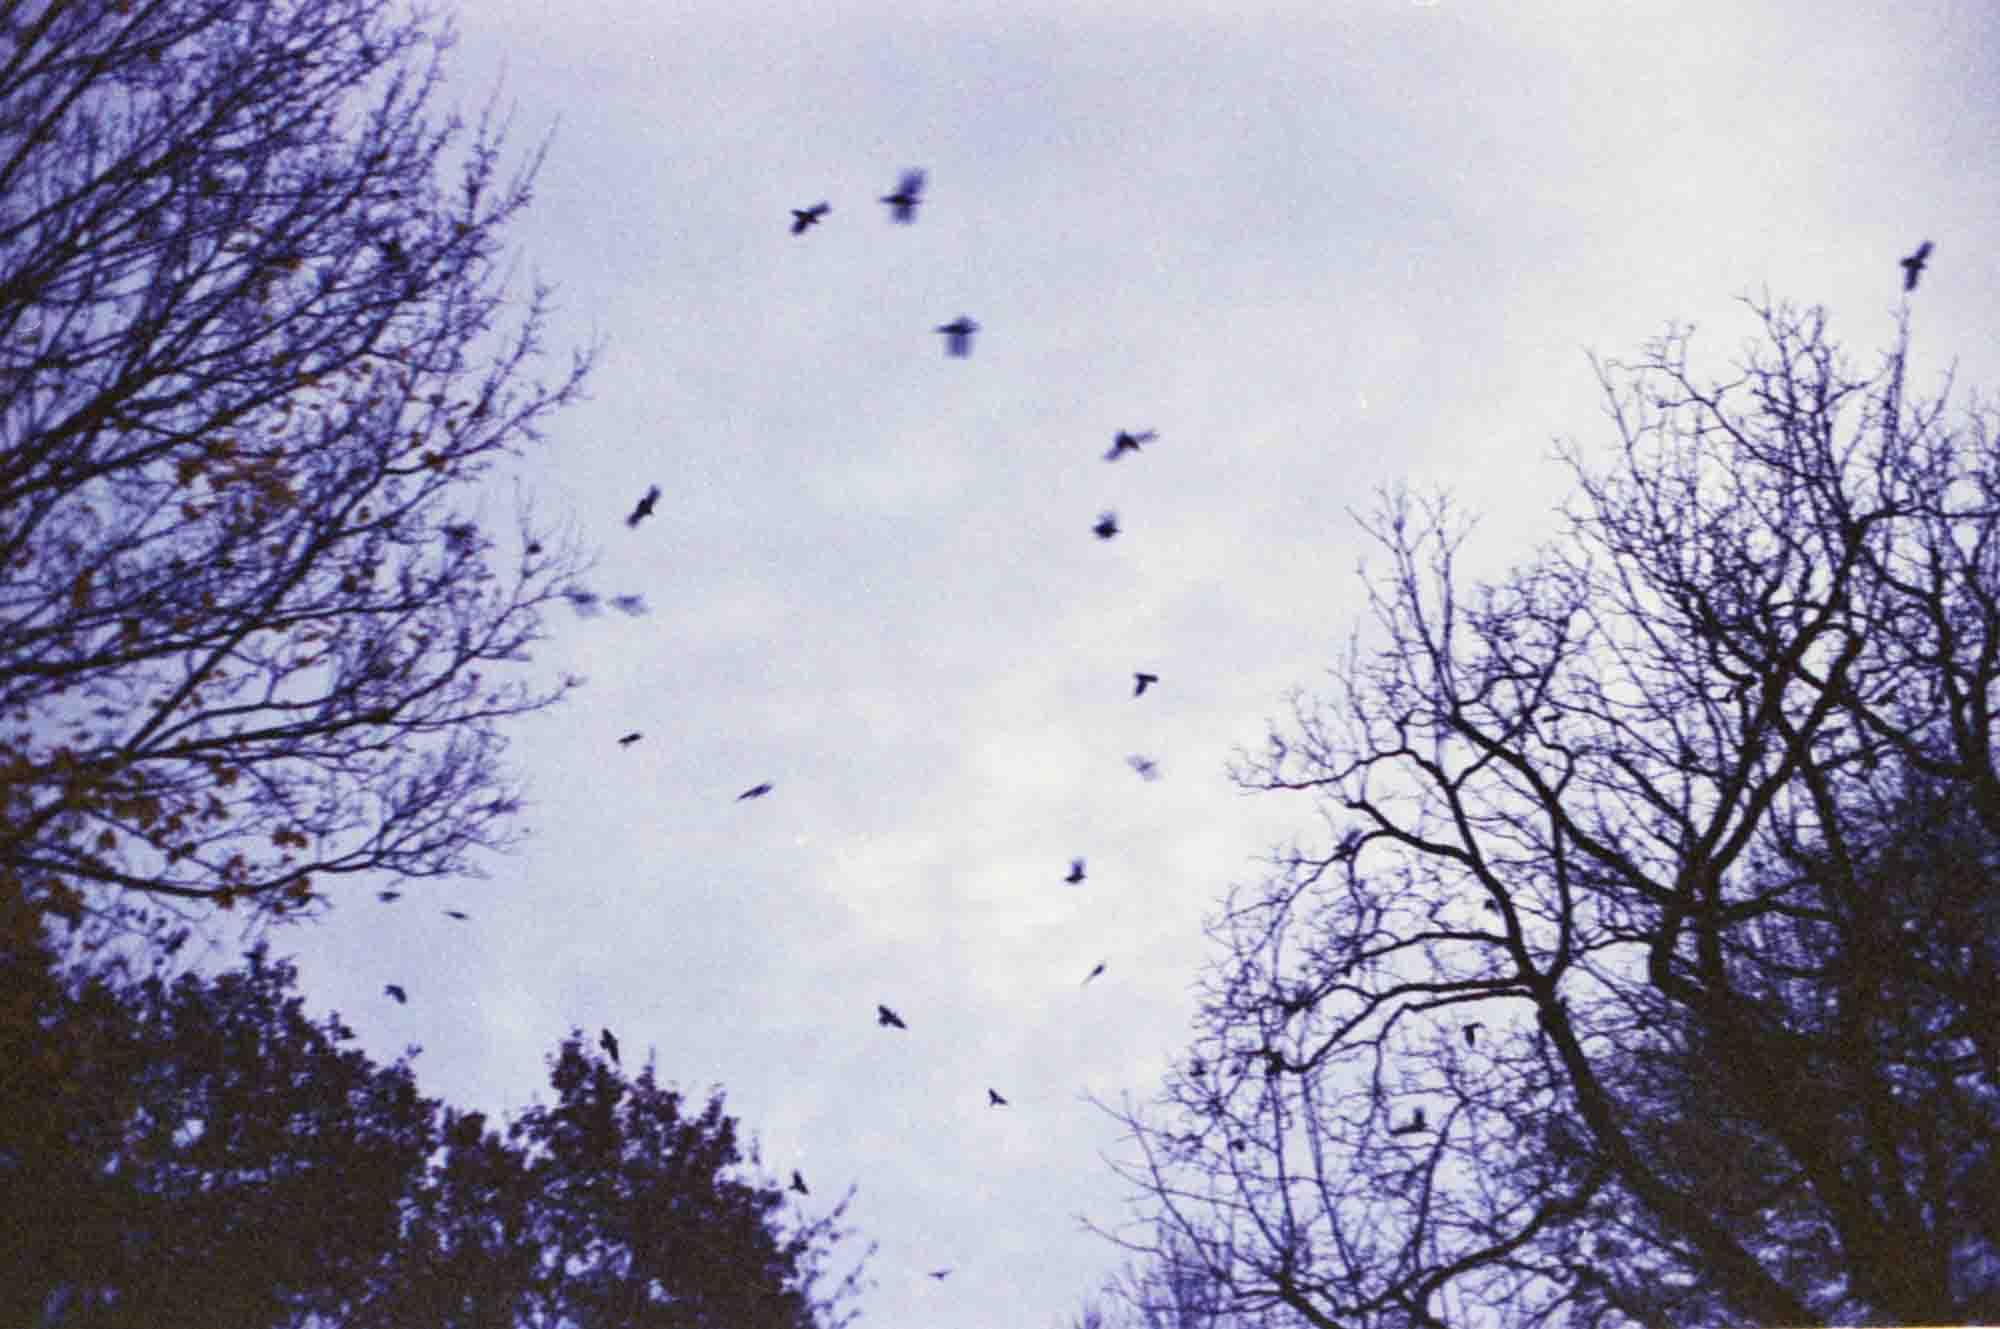 Flying birds | Pentax ME Super | Press Color 200 expired 10/2003